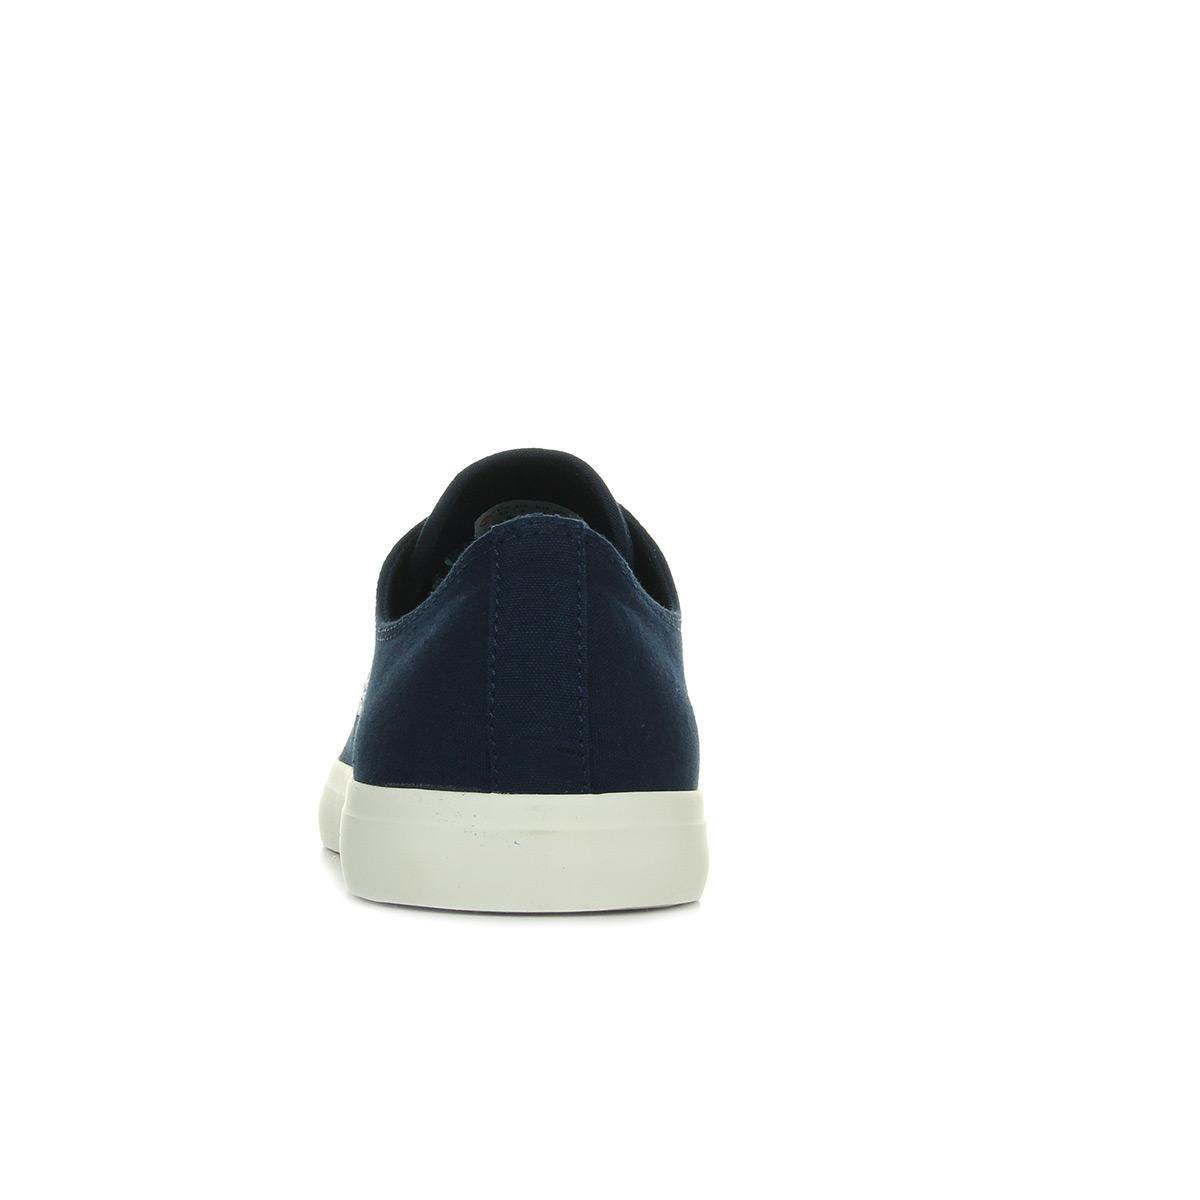 Timberland Union Warf Lace Bleu Marine CA1Q6A, Baskets mode homme